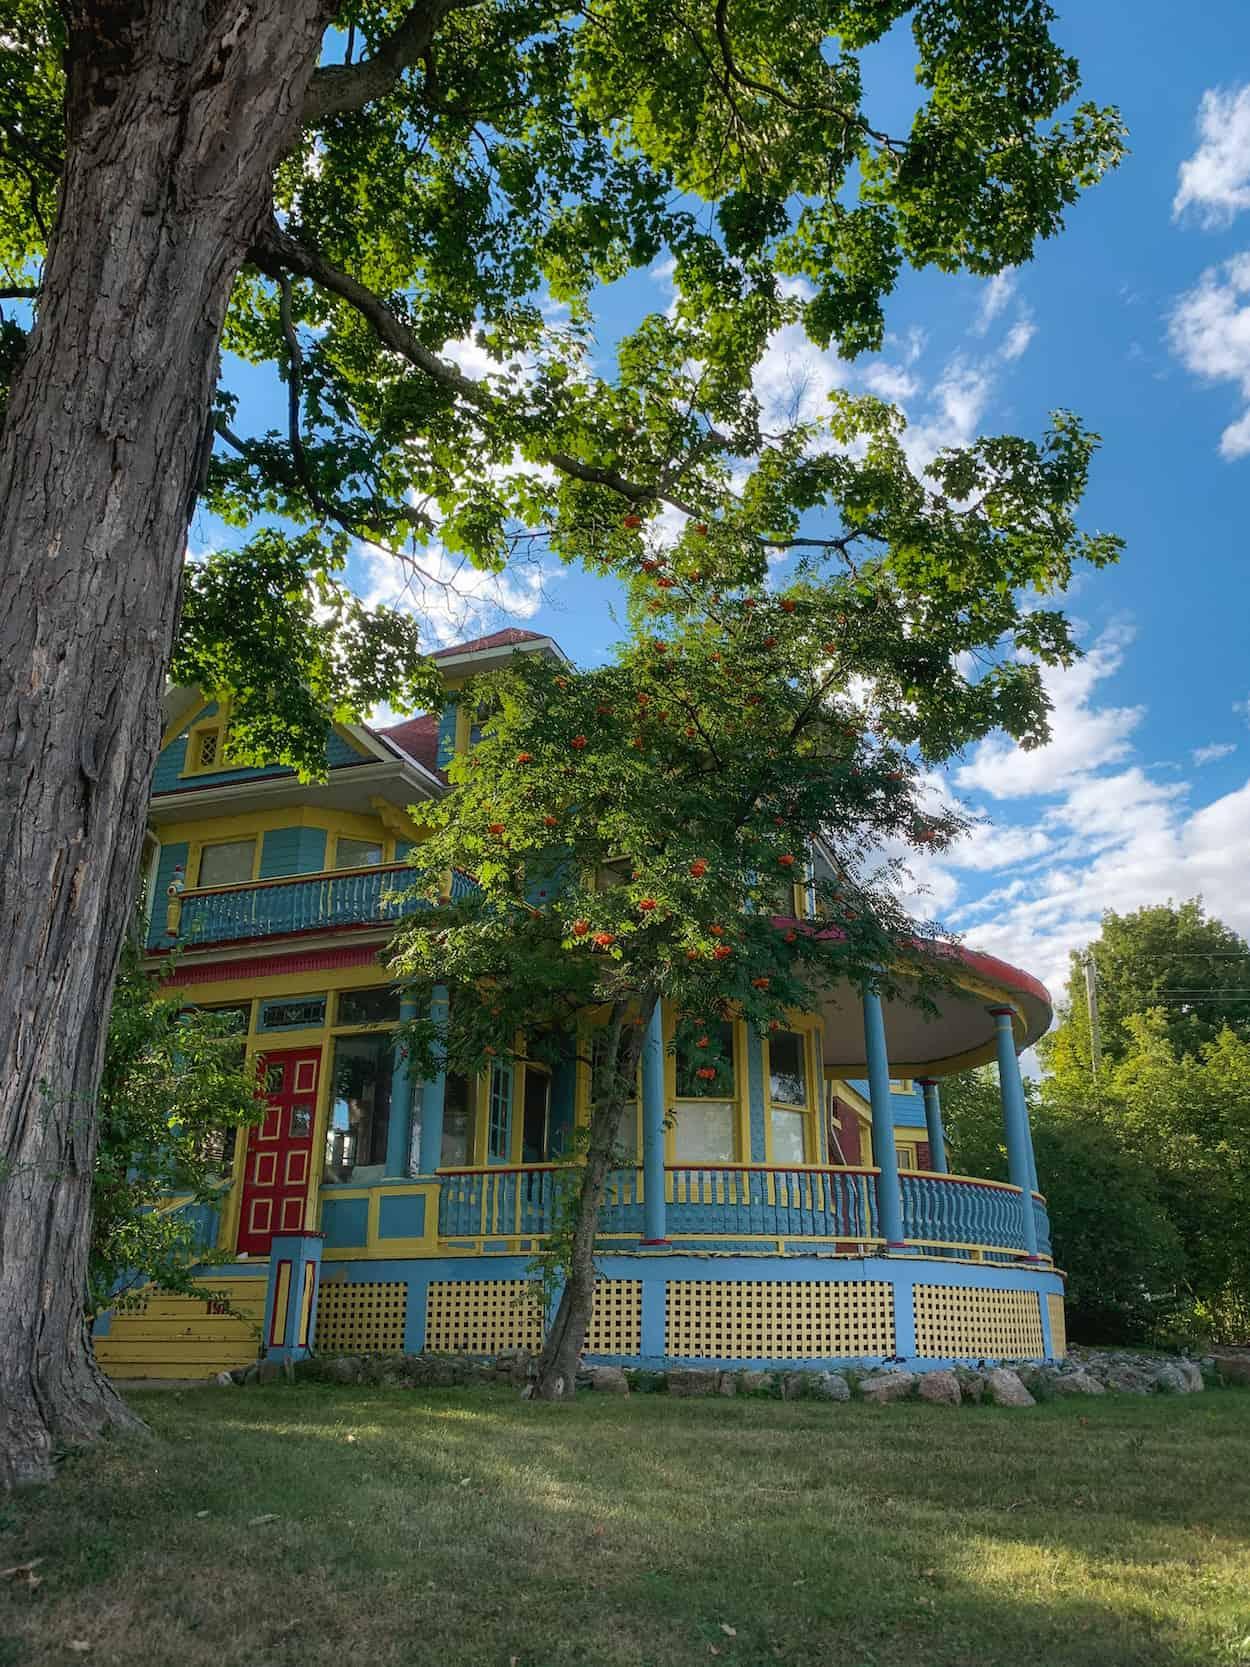 Colourful house in Gananoque, Ontario